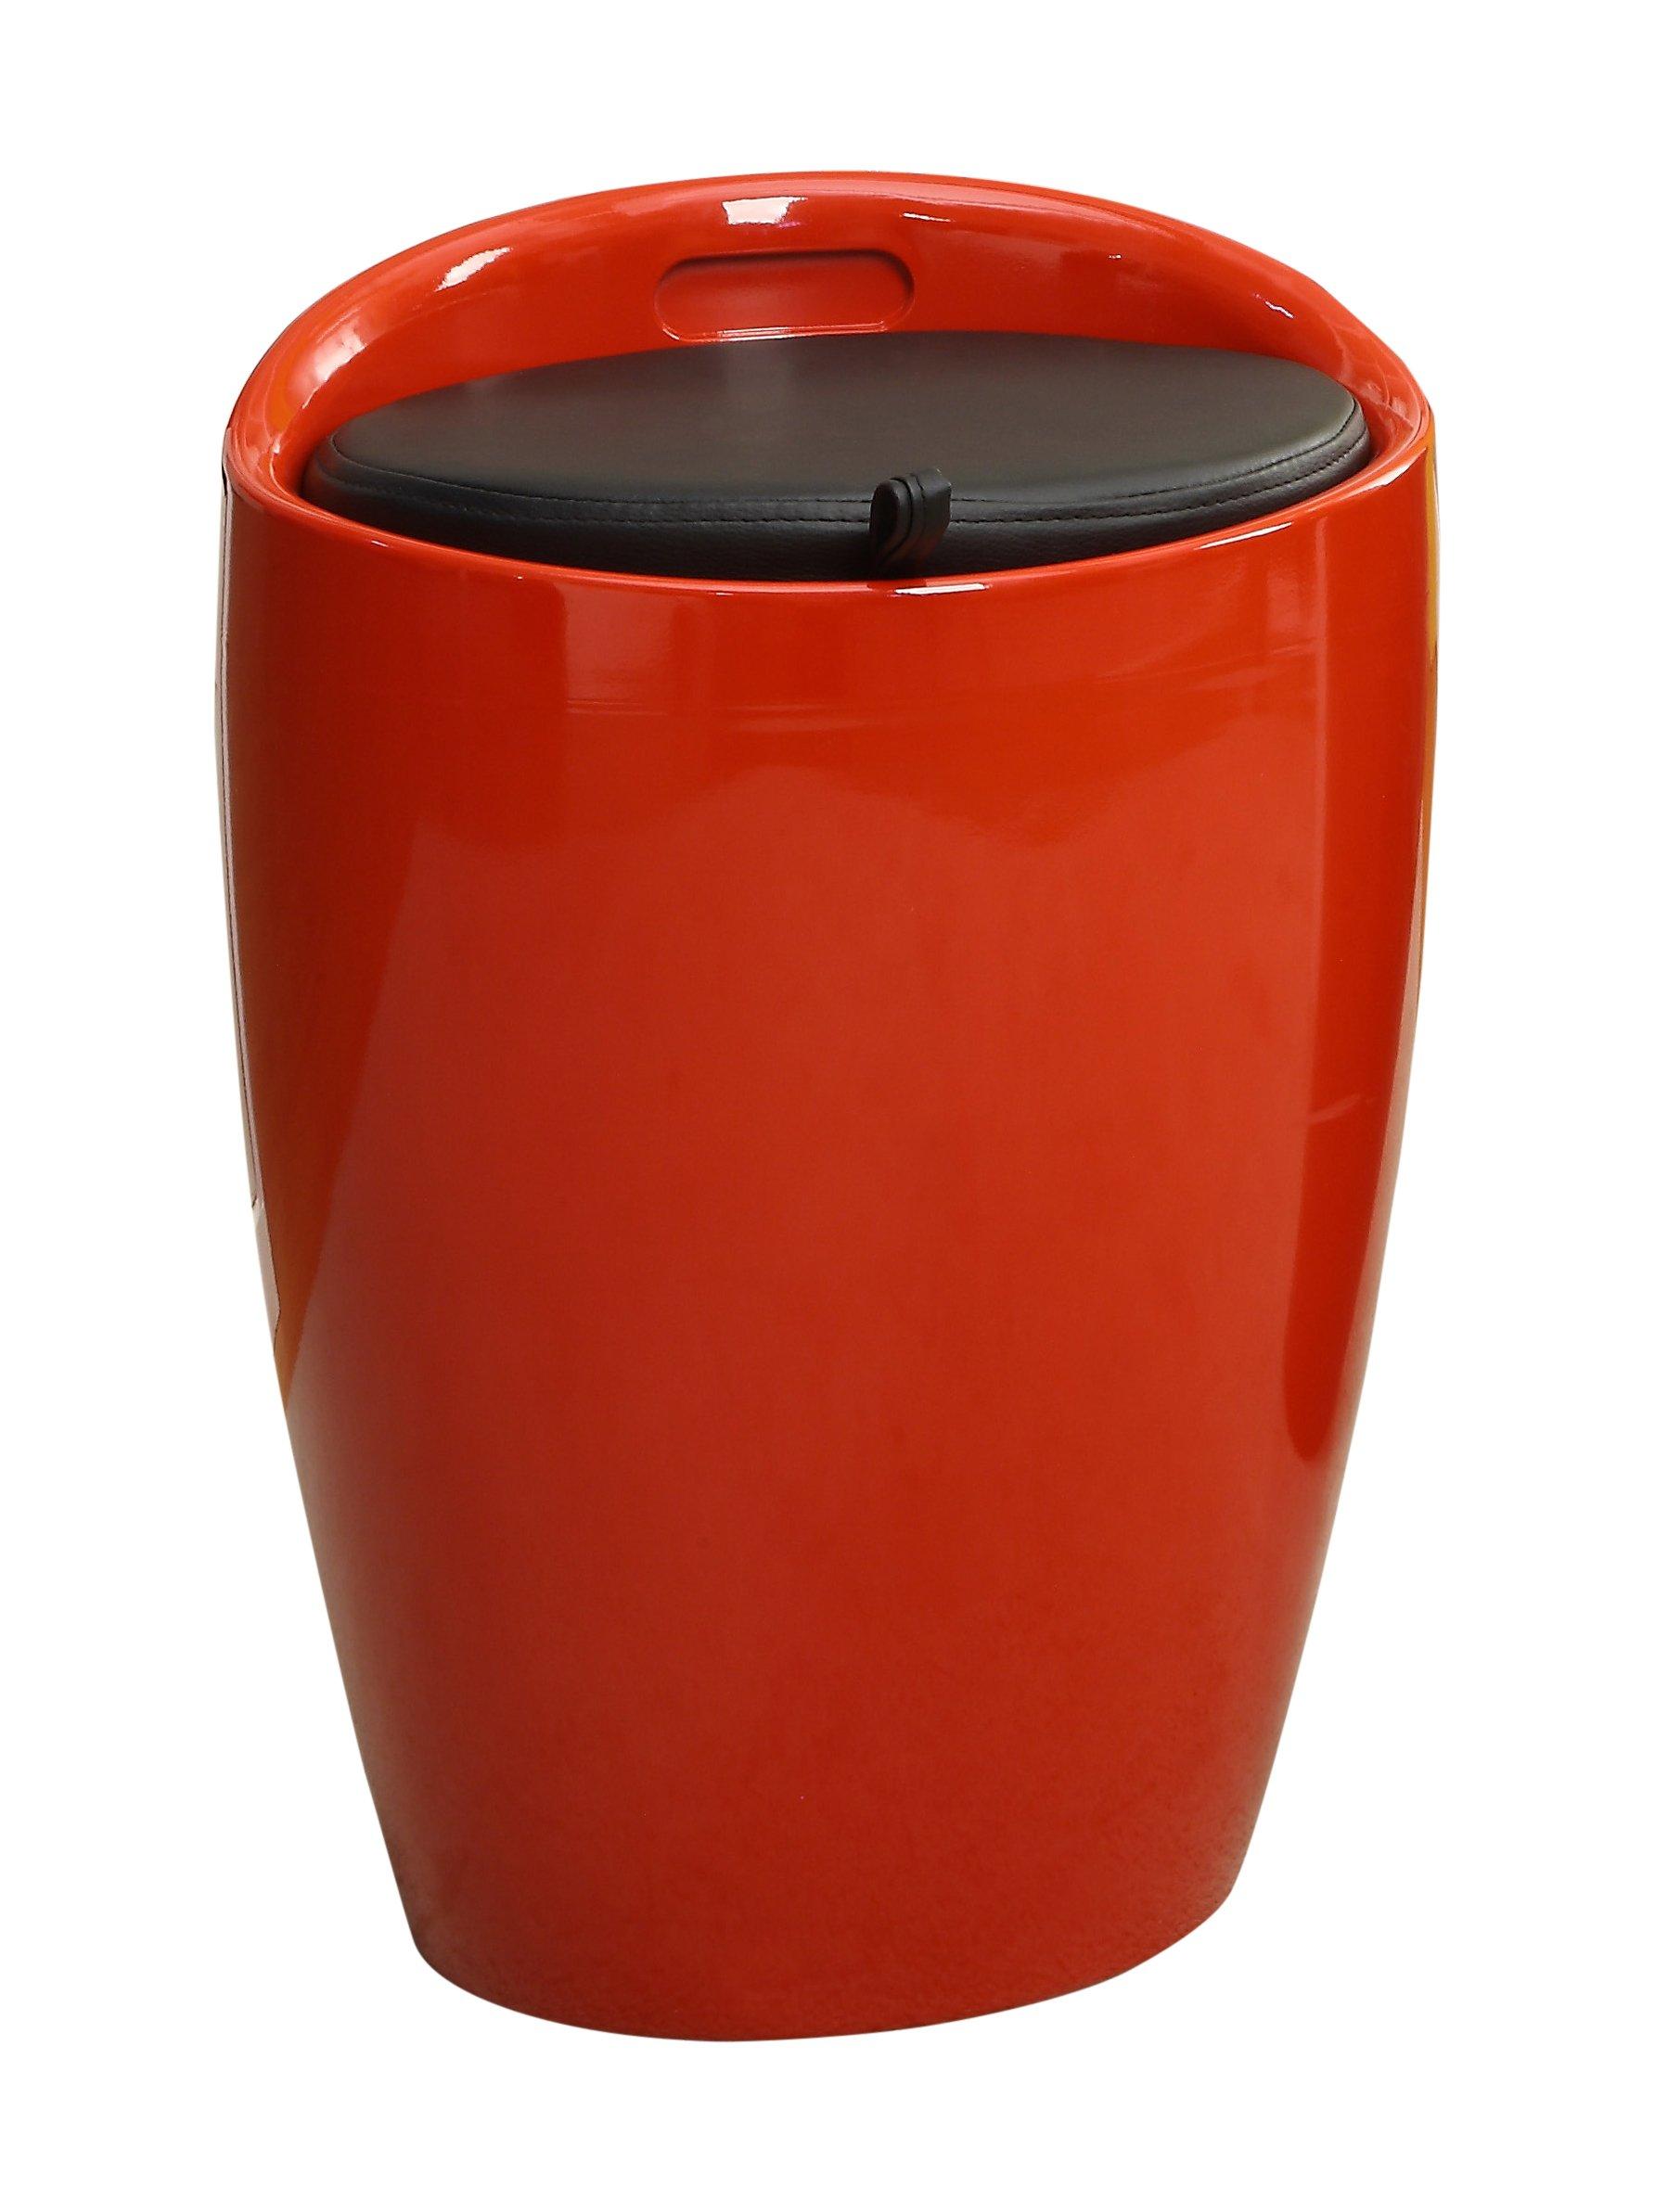 Furniture of America Kipper Glossy Storage Stool, Red